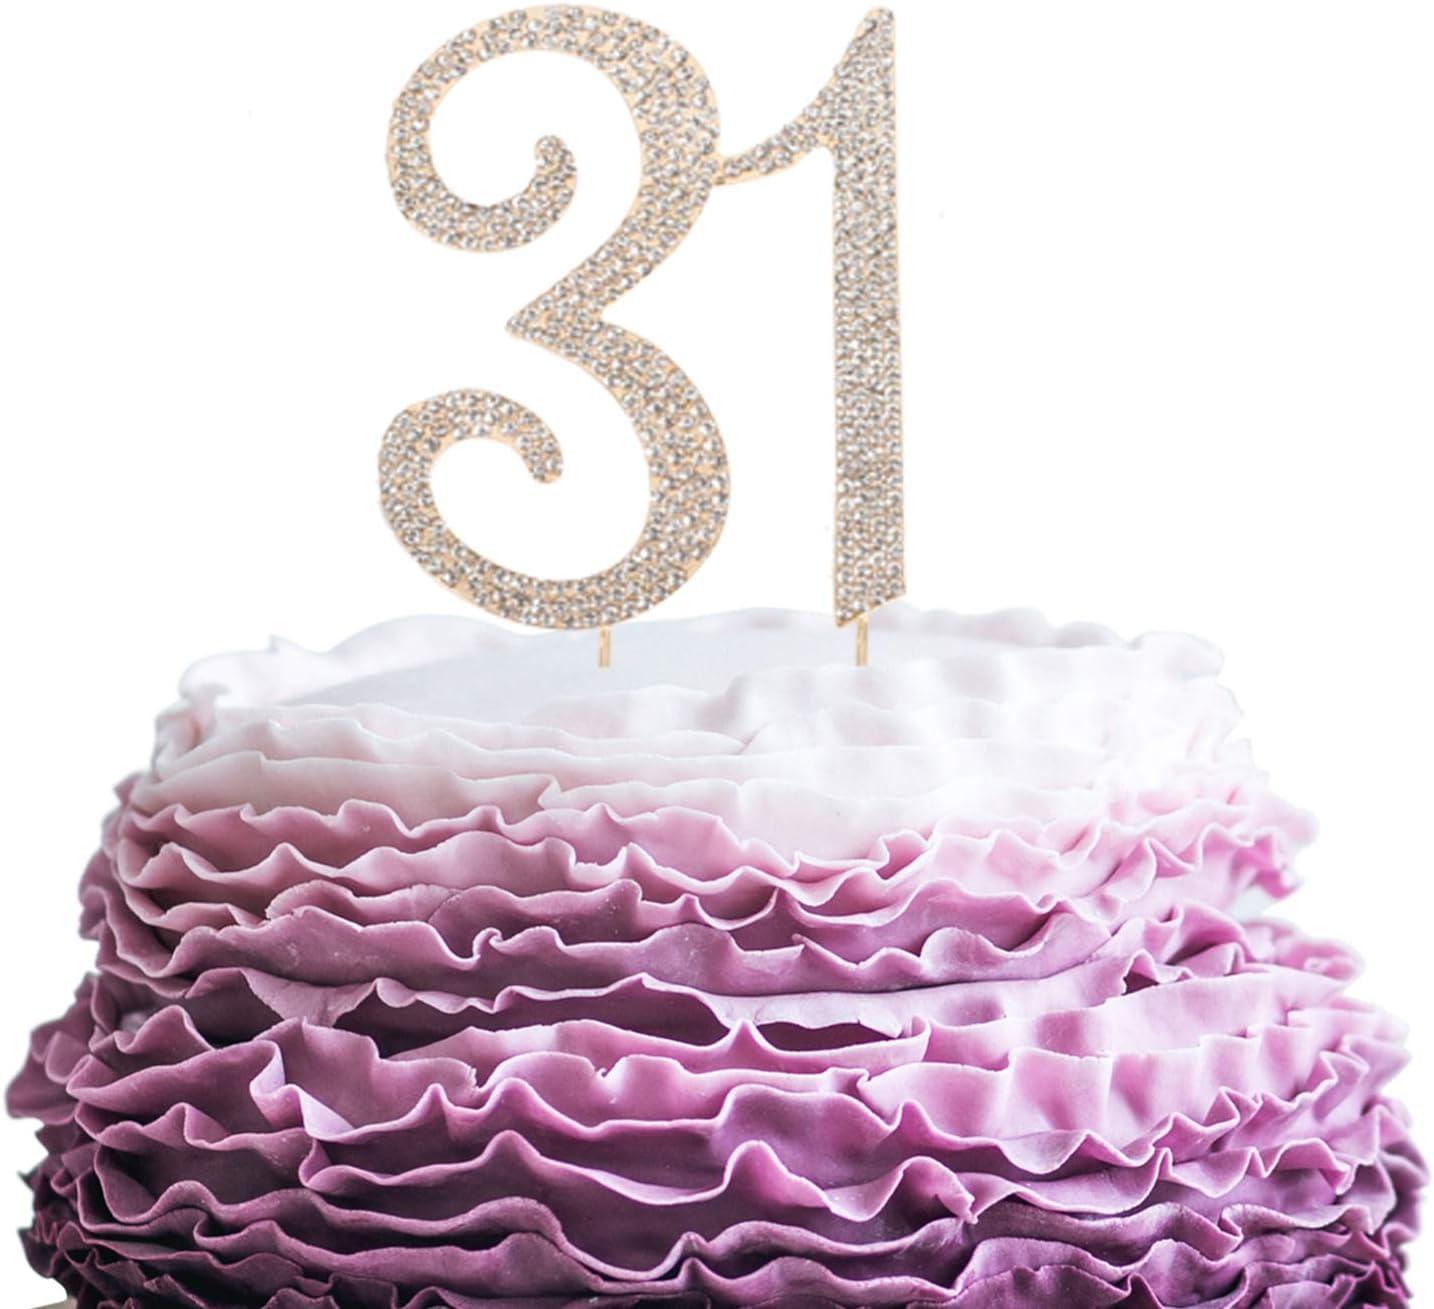 Astonishing Lingpar 31 Years Birthday Cake Topper New Best Crystal Funny Birthday Cards Online Barepcheapnameinfo